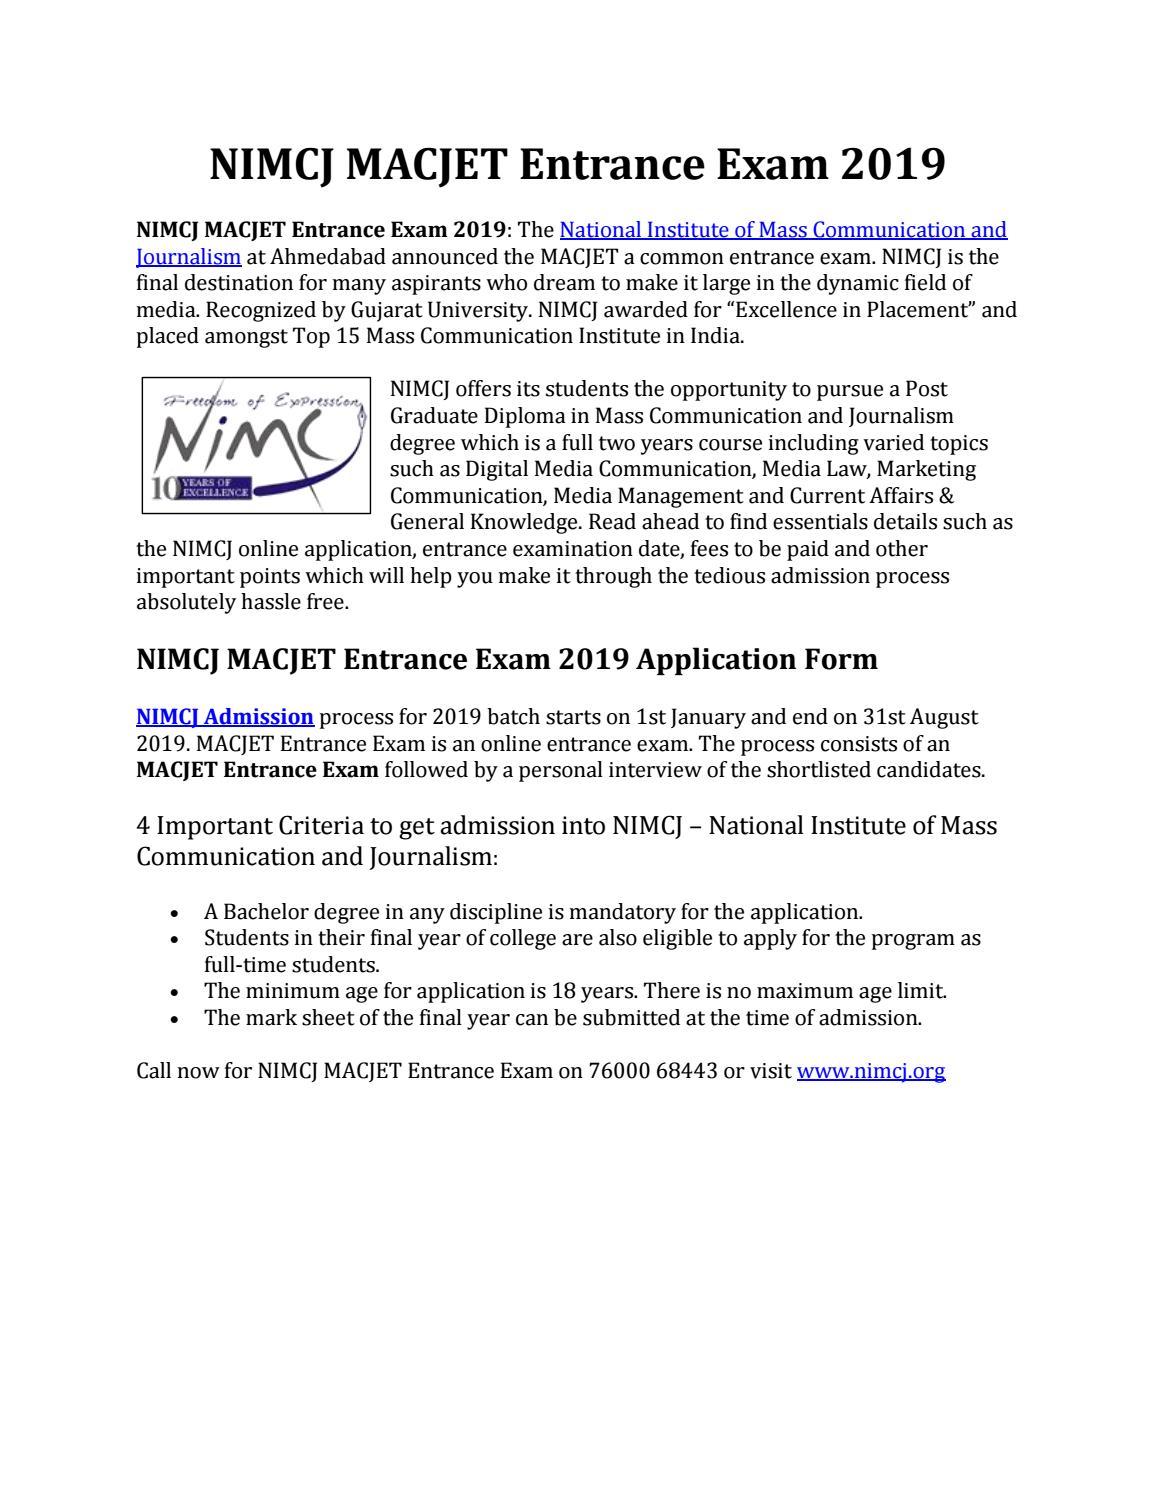 NIMCJ MACJET Entrance Exam 2019 by NIMCJ - issuu